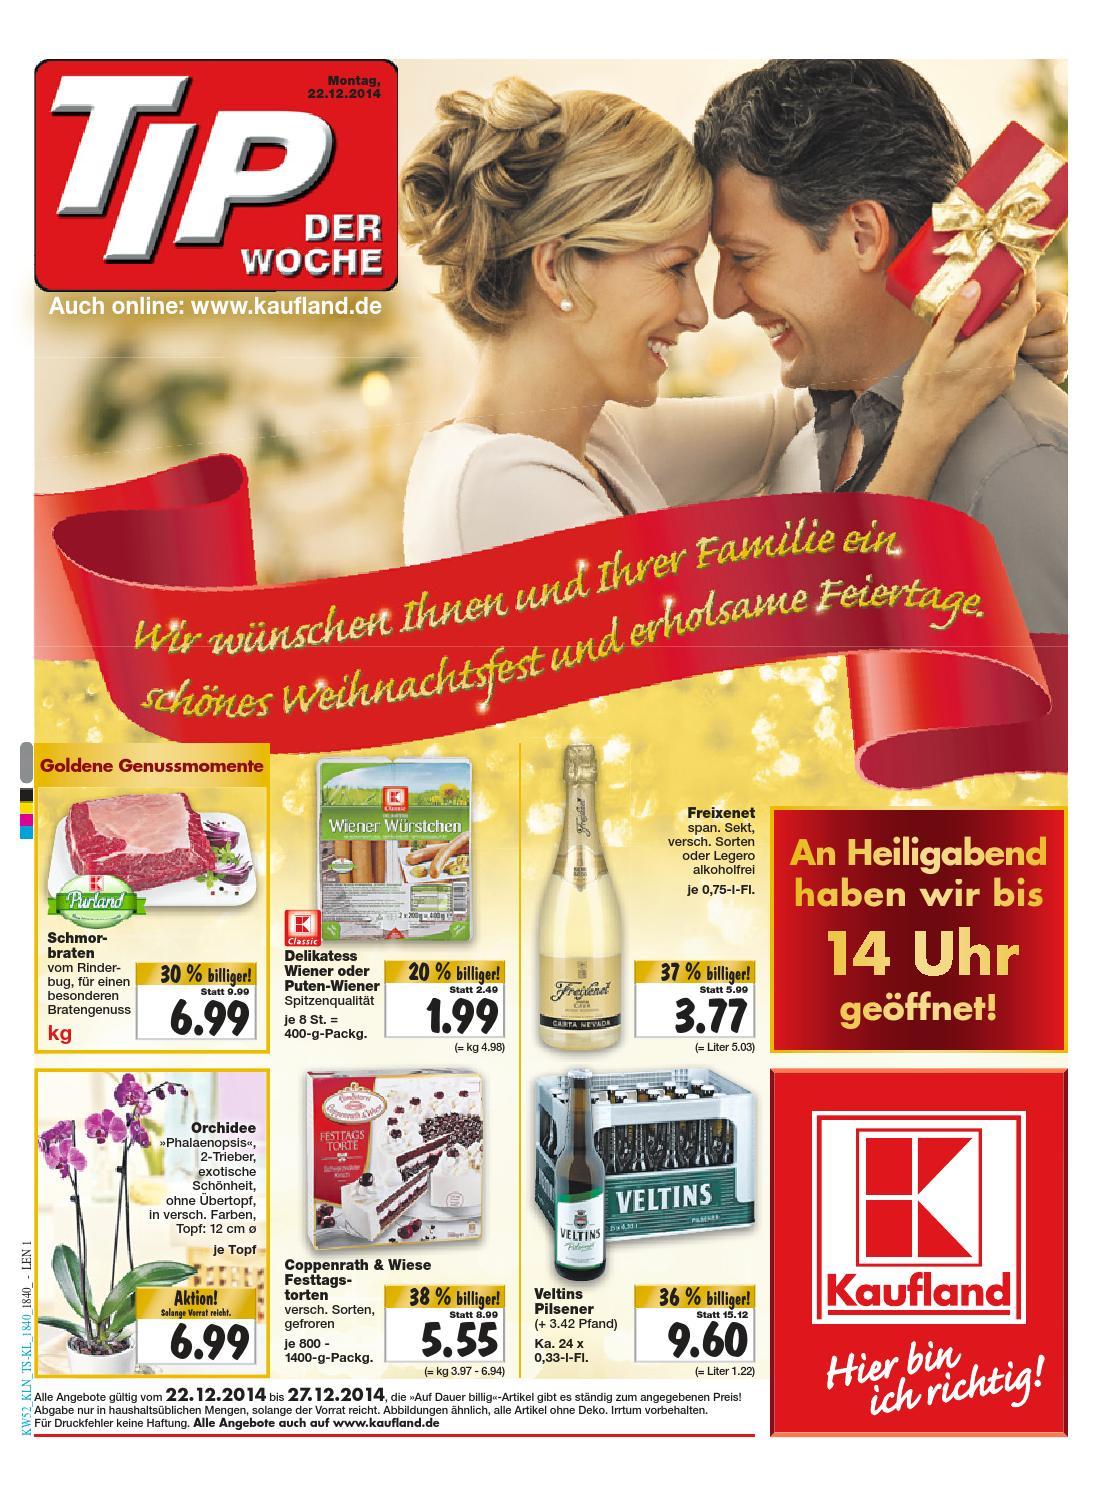 Kaufland Prospekt - Angebote ab 22.12.14 by Onlineprospekt - issuu